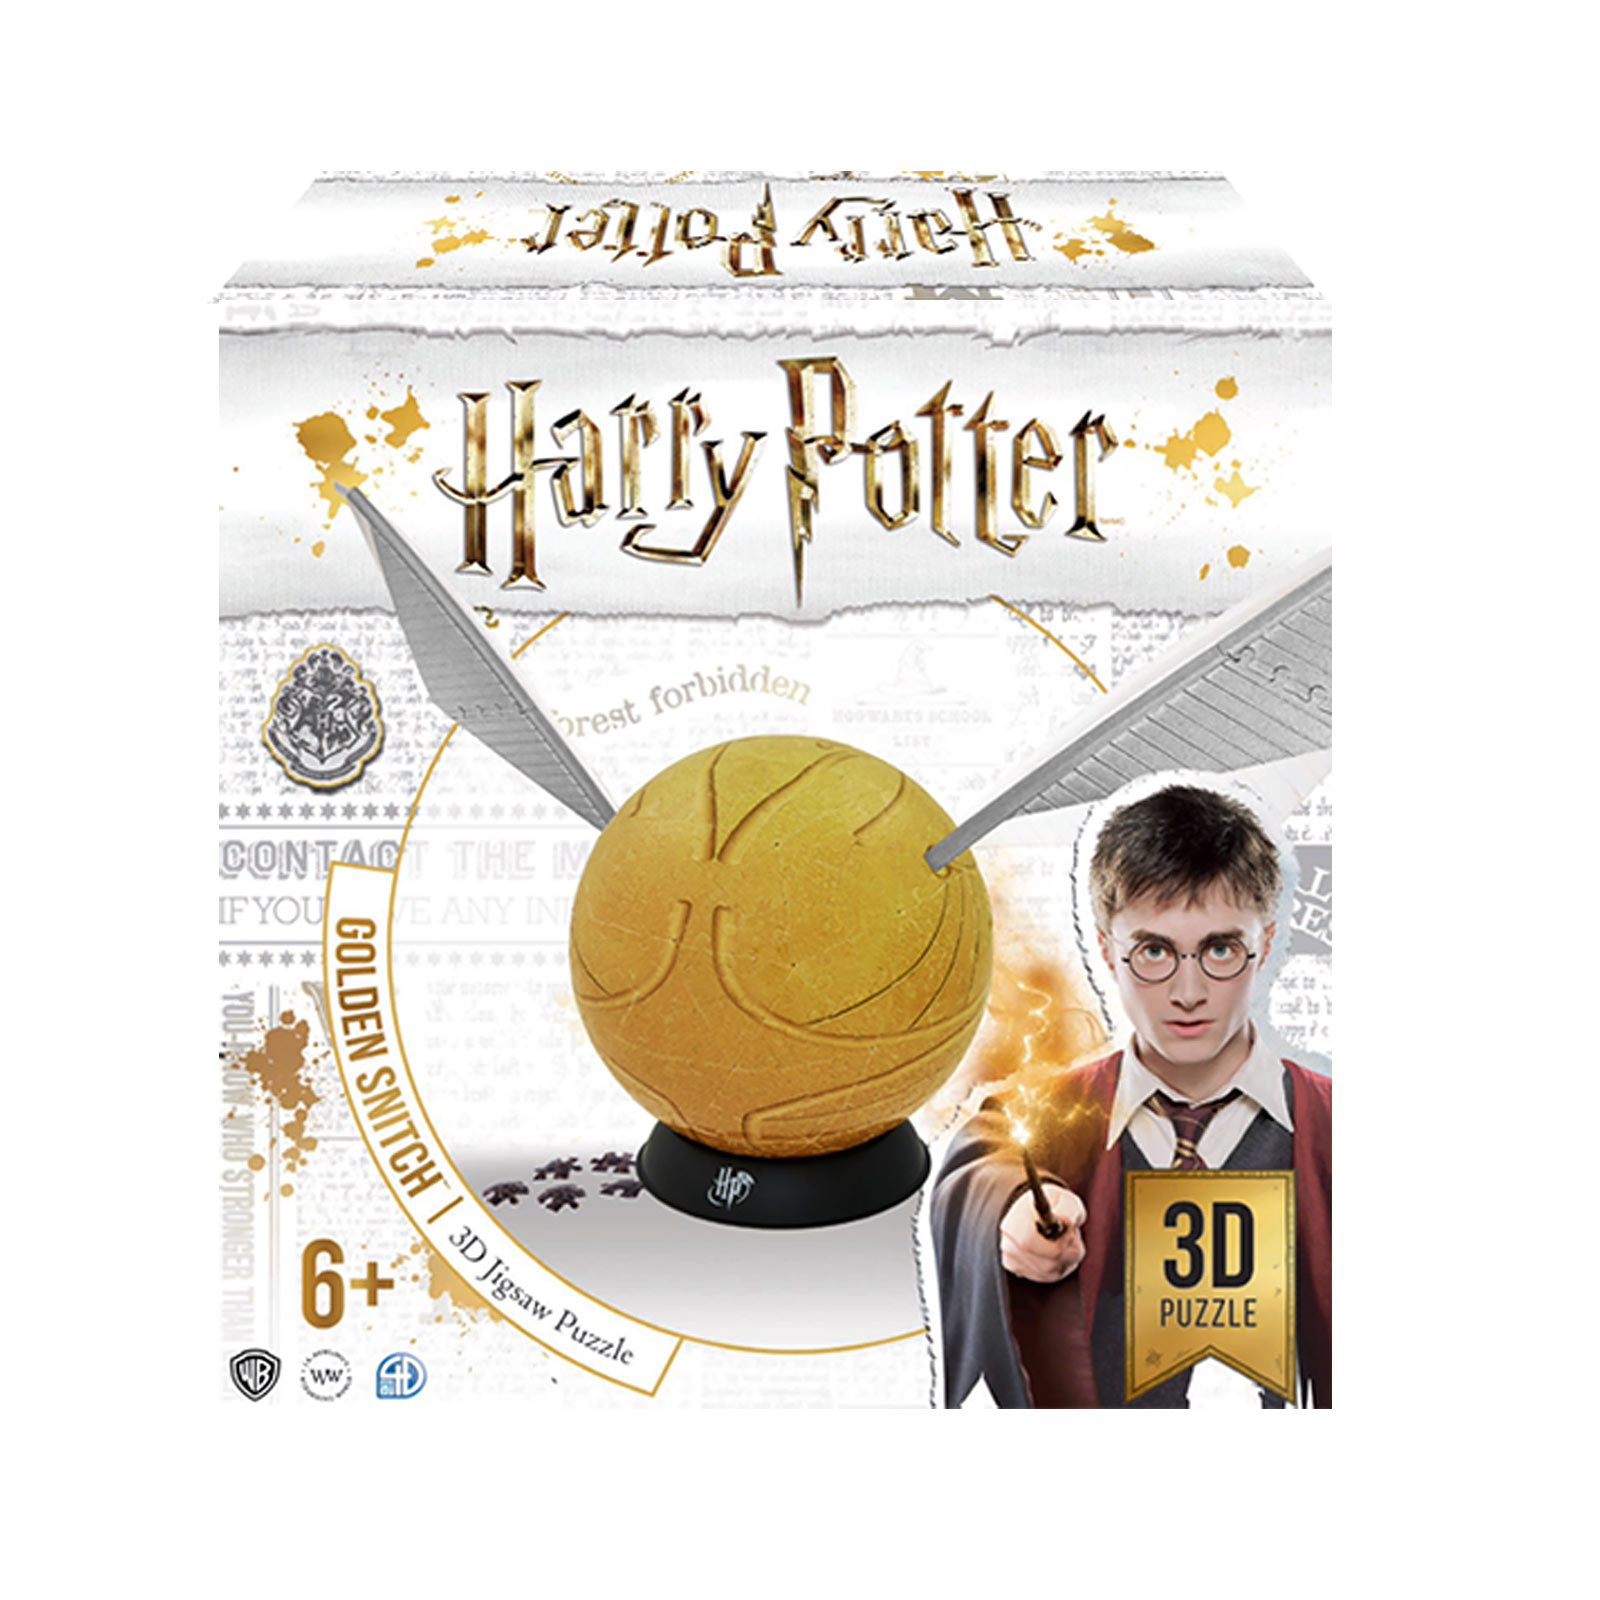 Harry Potter - Goldener Schnatz 3D Puzzle